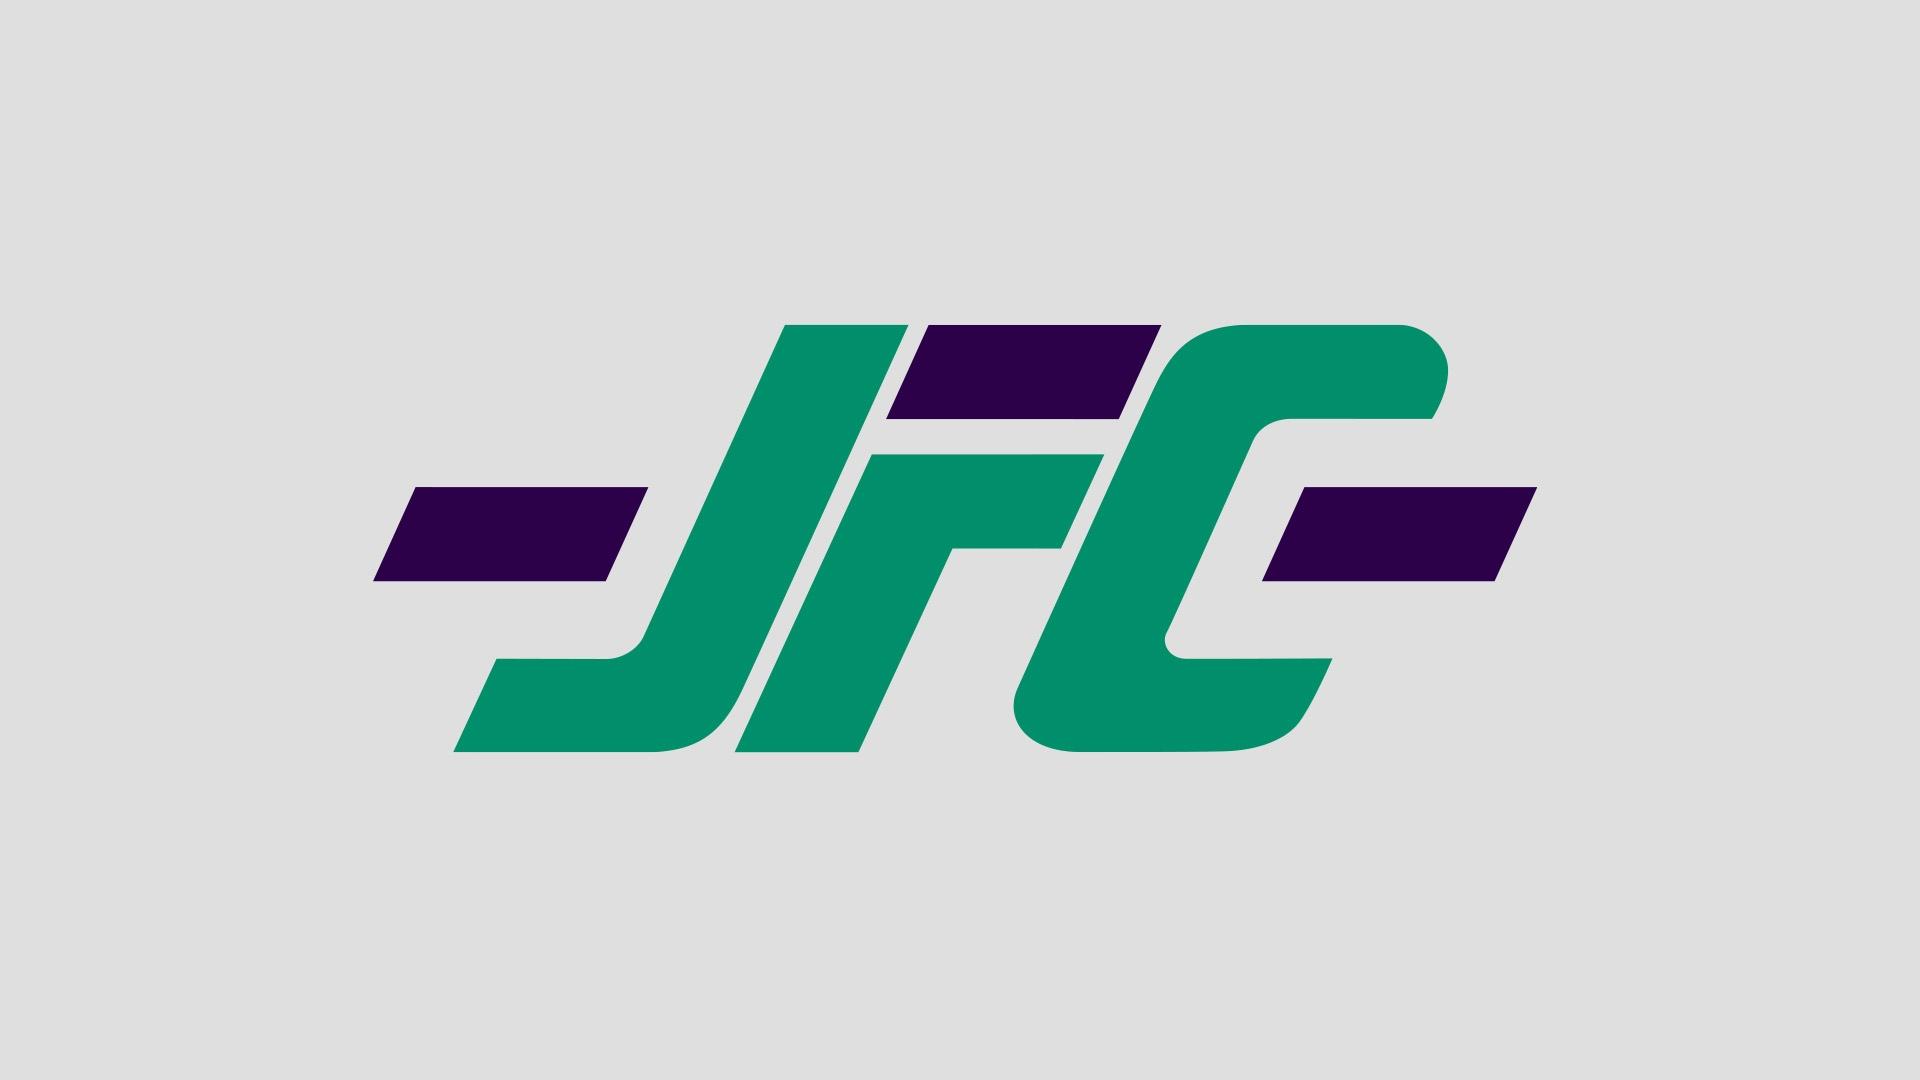 JFC Image 8